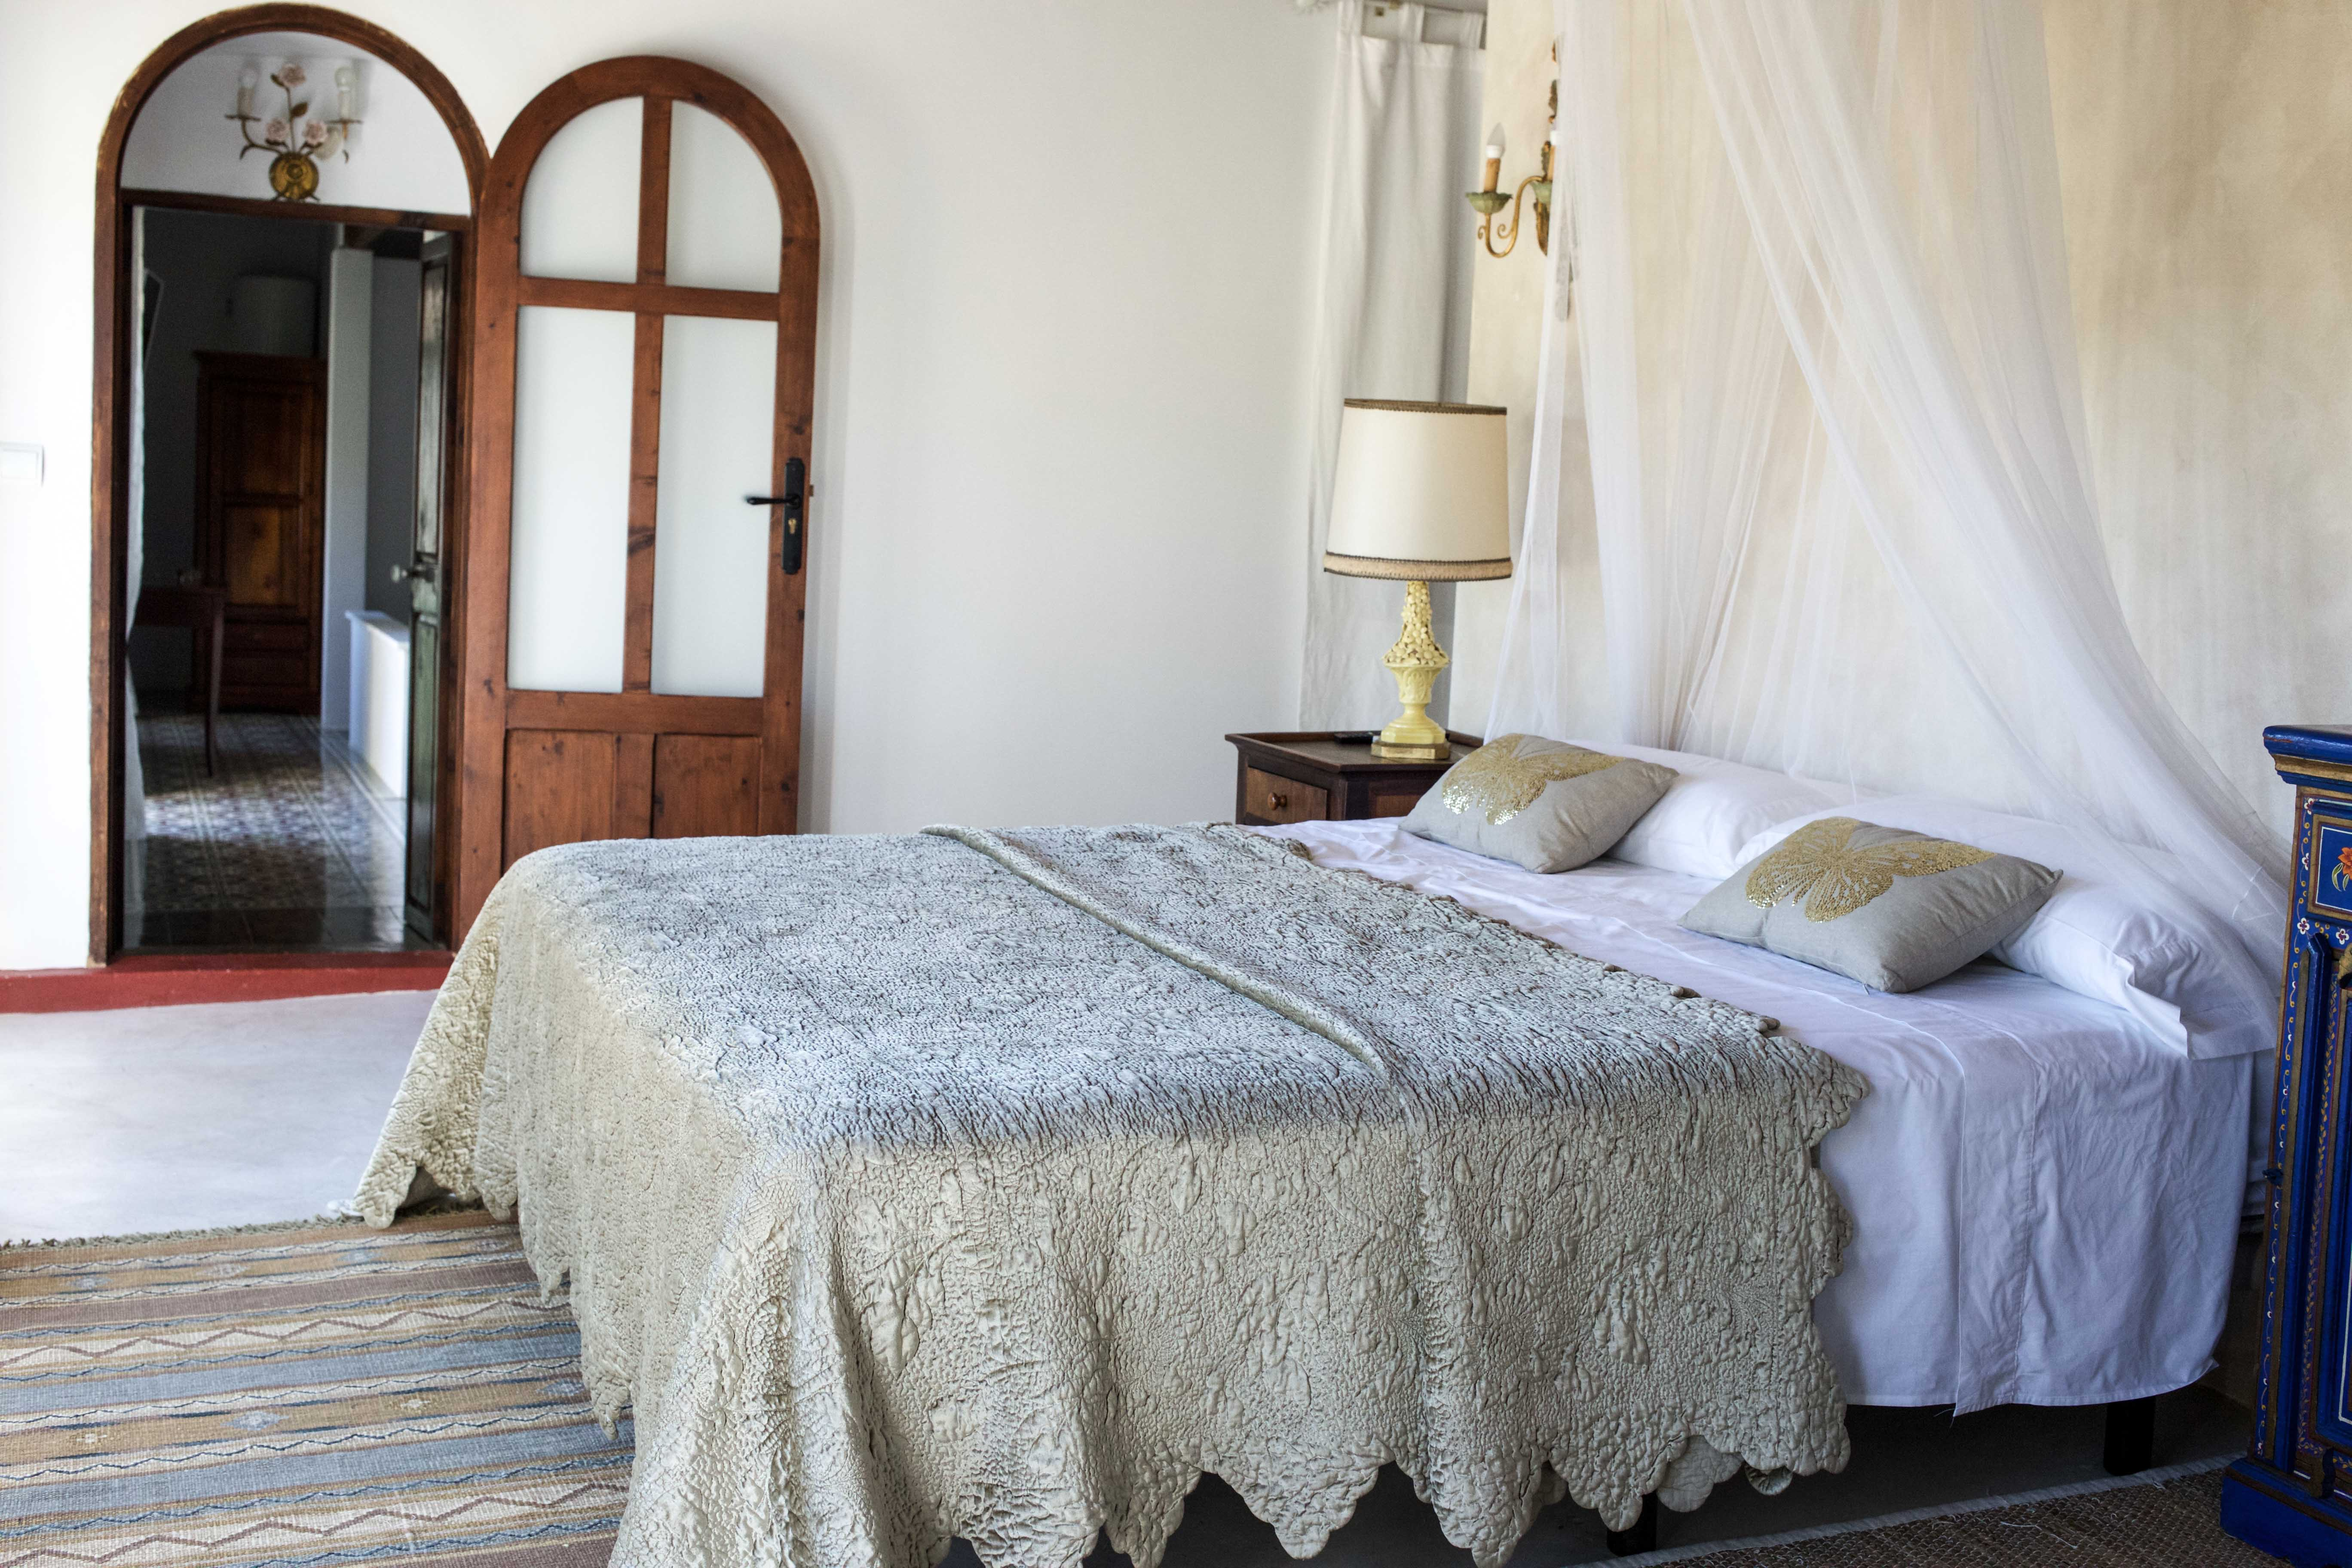 travelblog-reiseblog-ibiza-kurztrip-mädelstrip-luxus-villa_9182